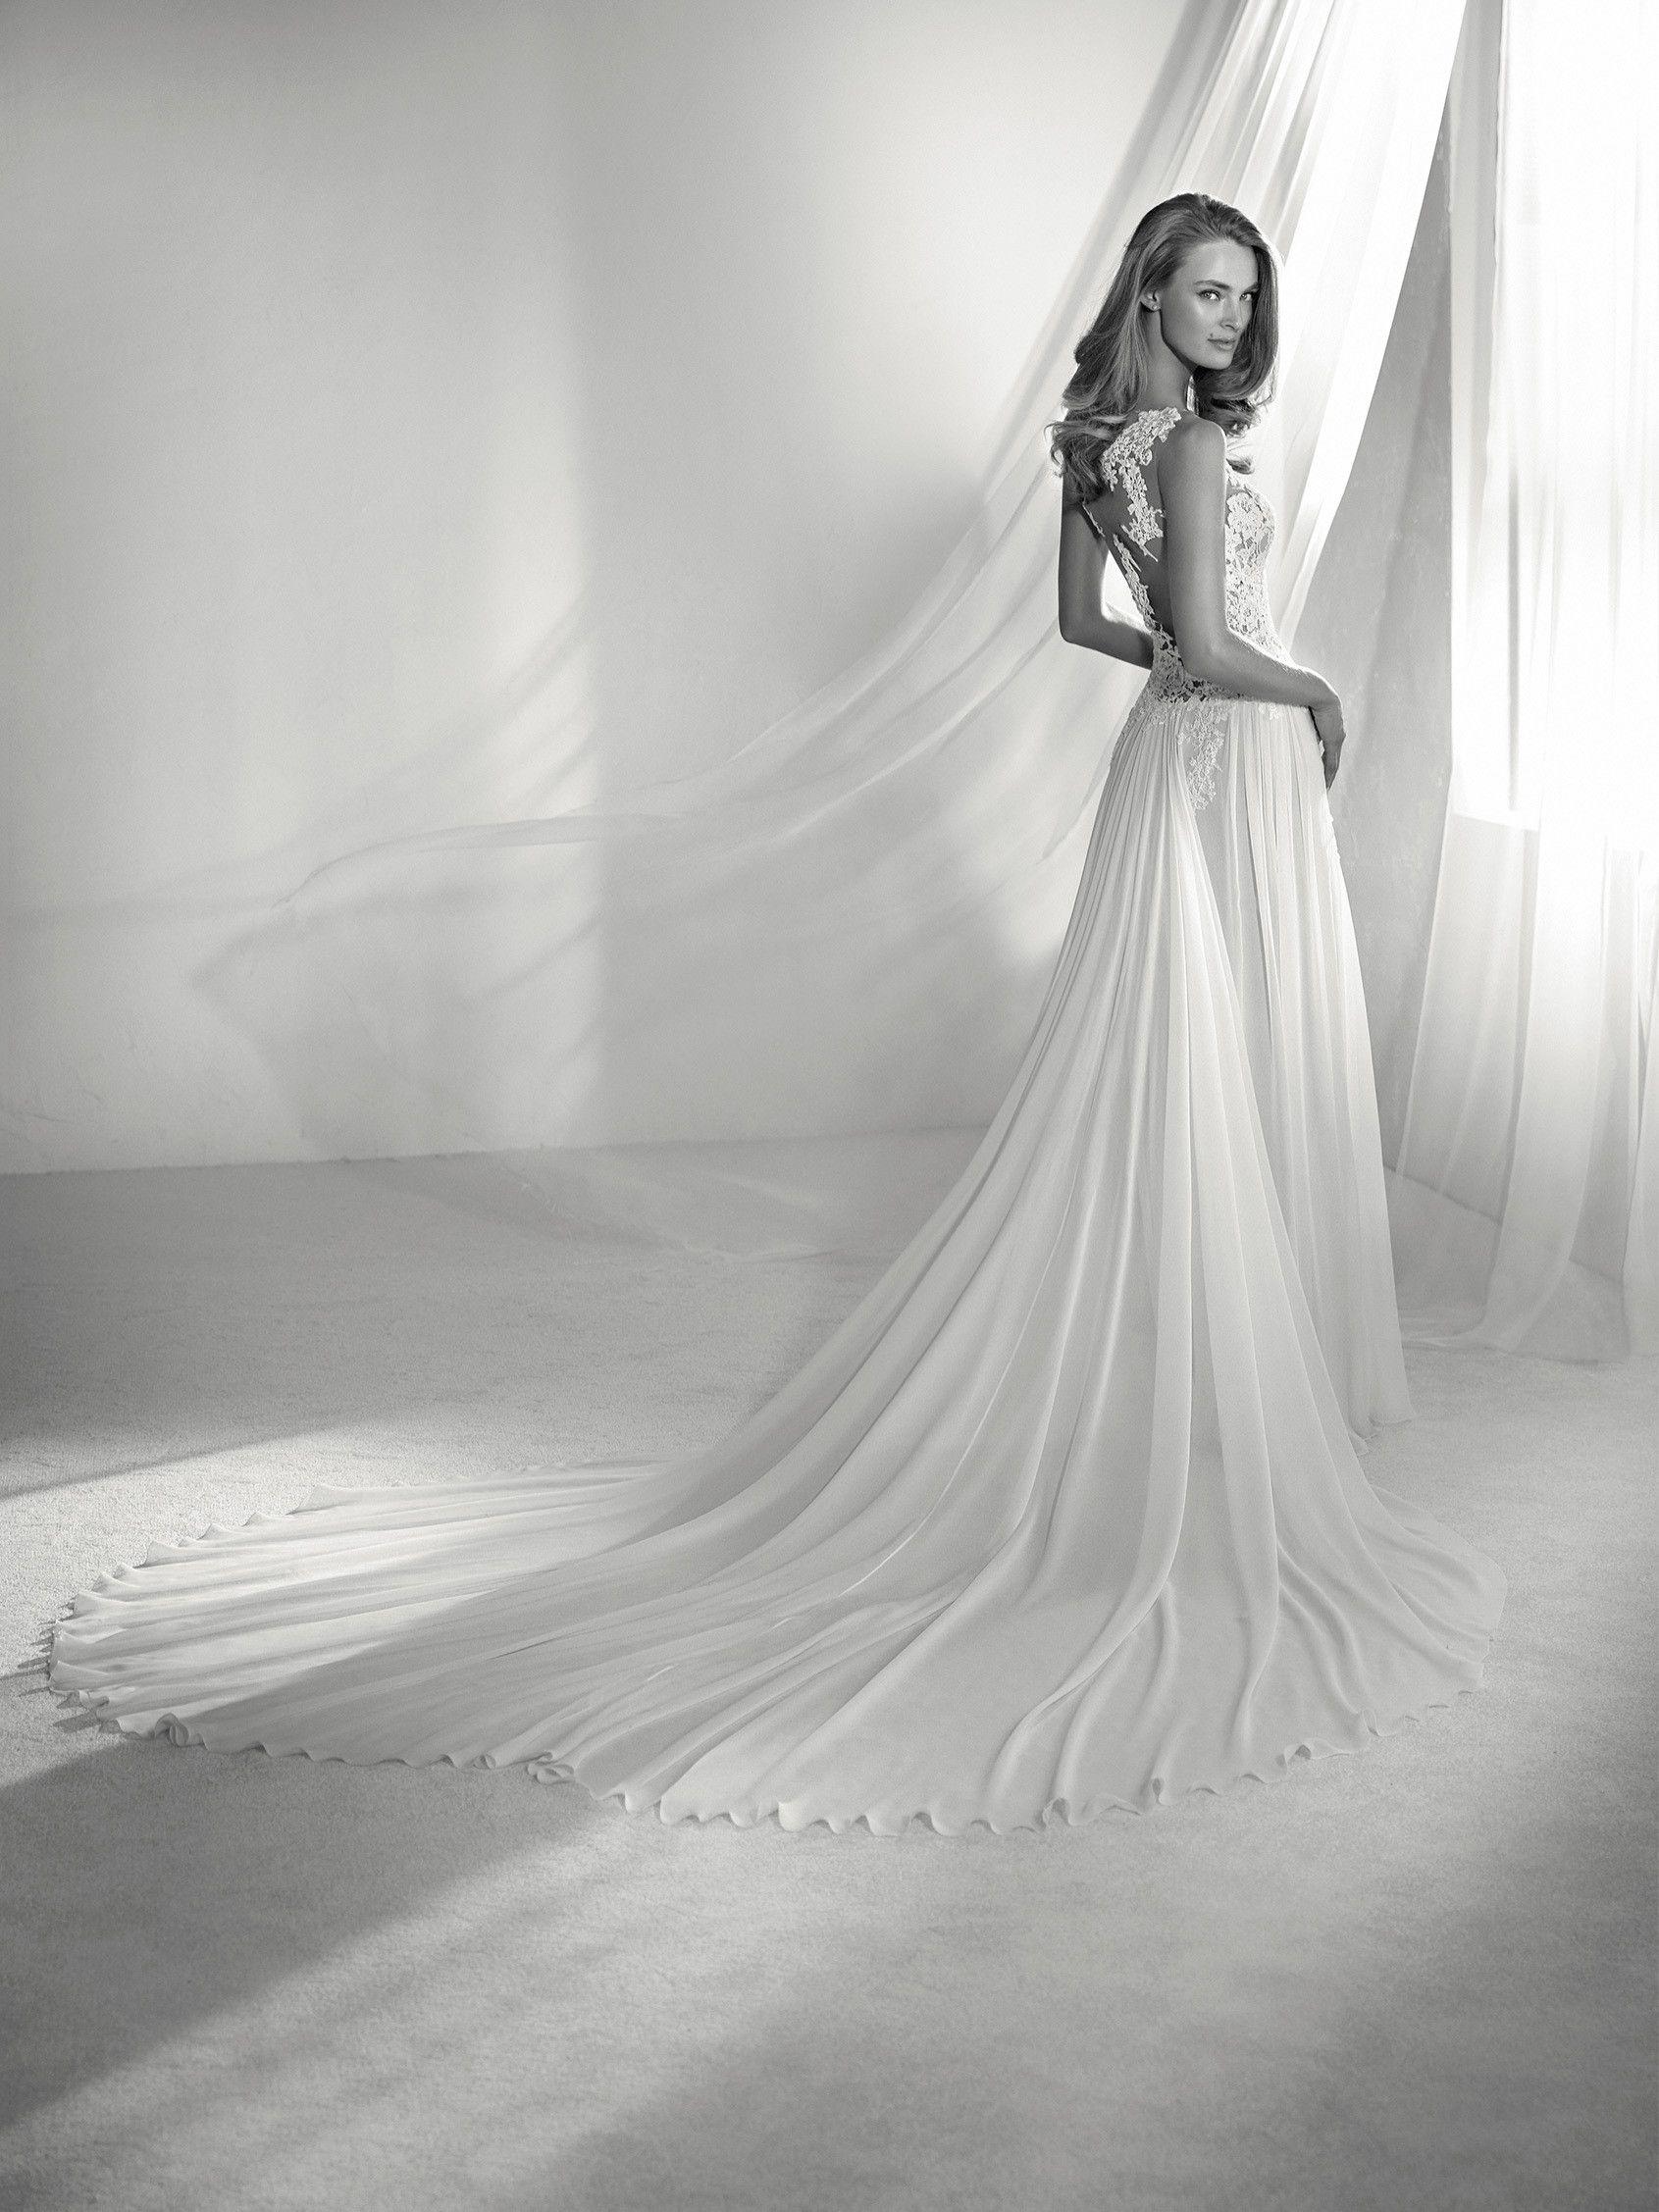 Wedding dress skirt movement pronovias collection eib